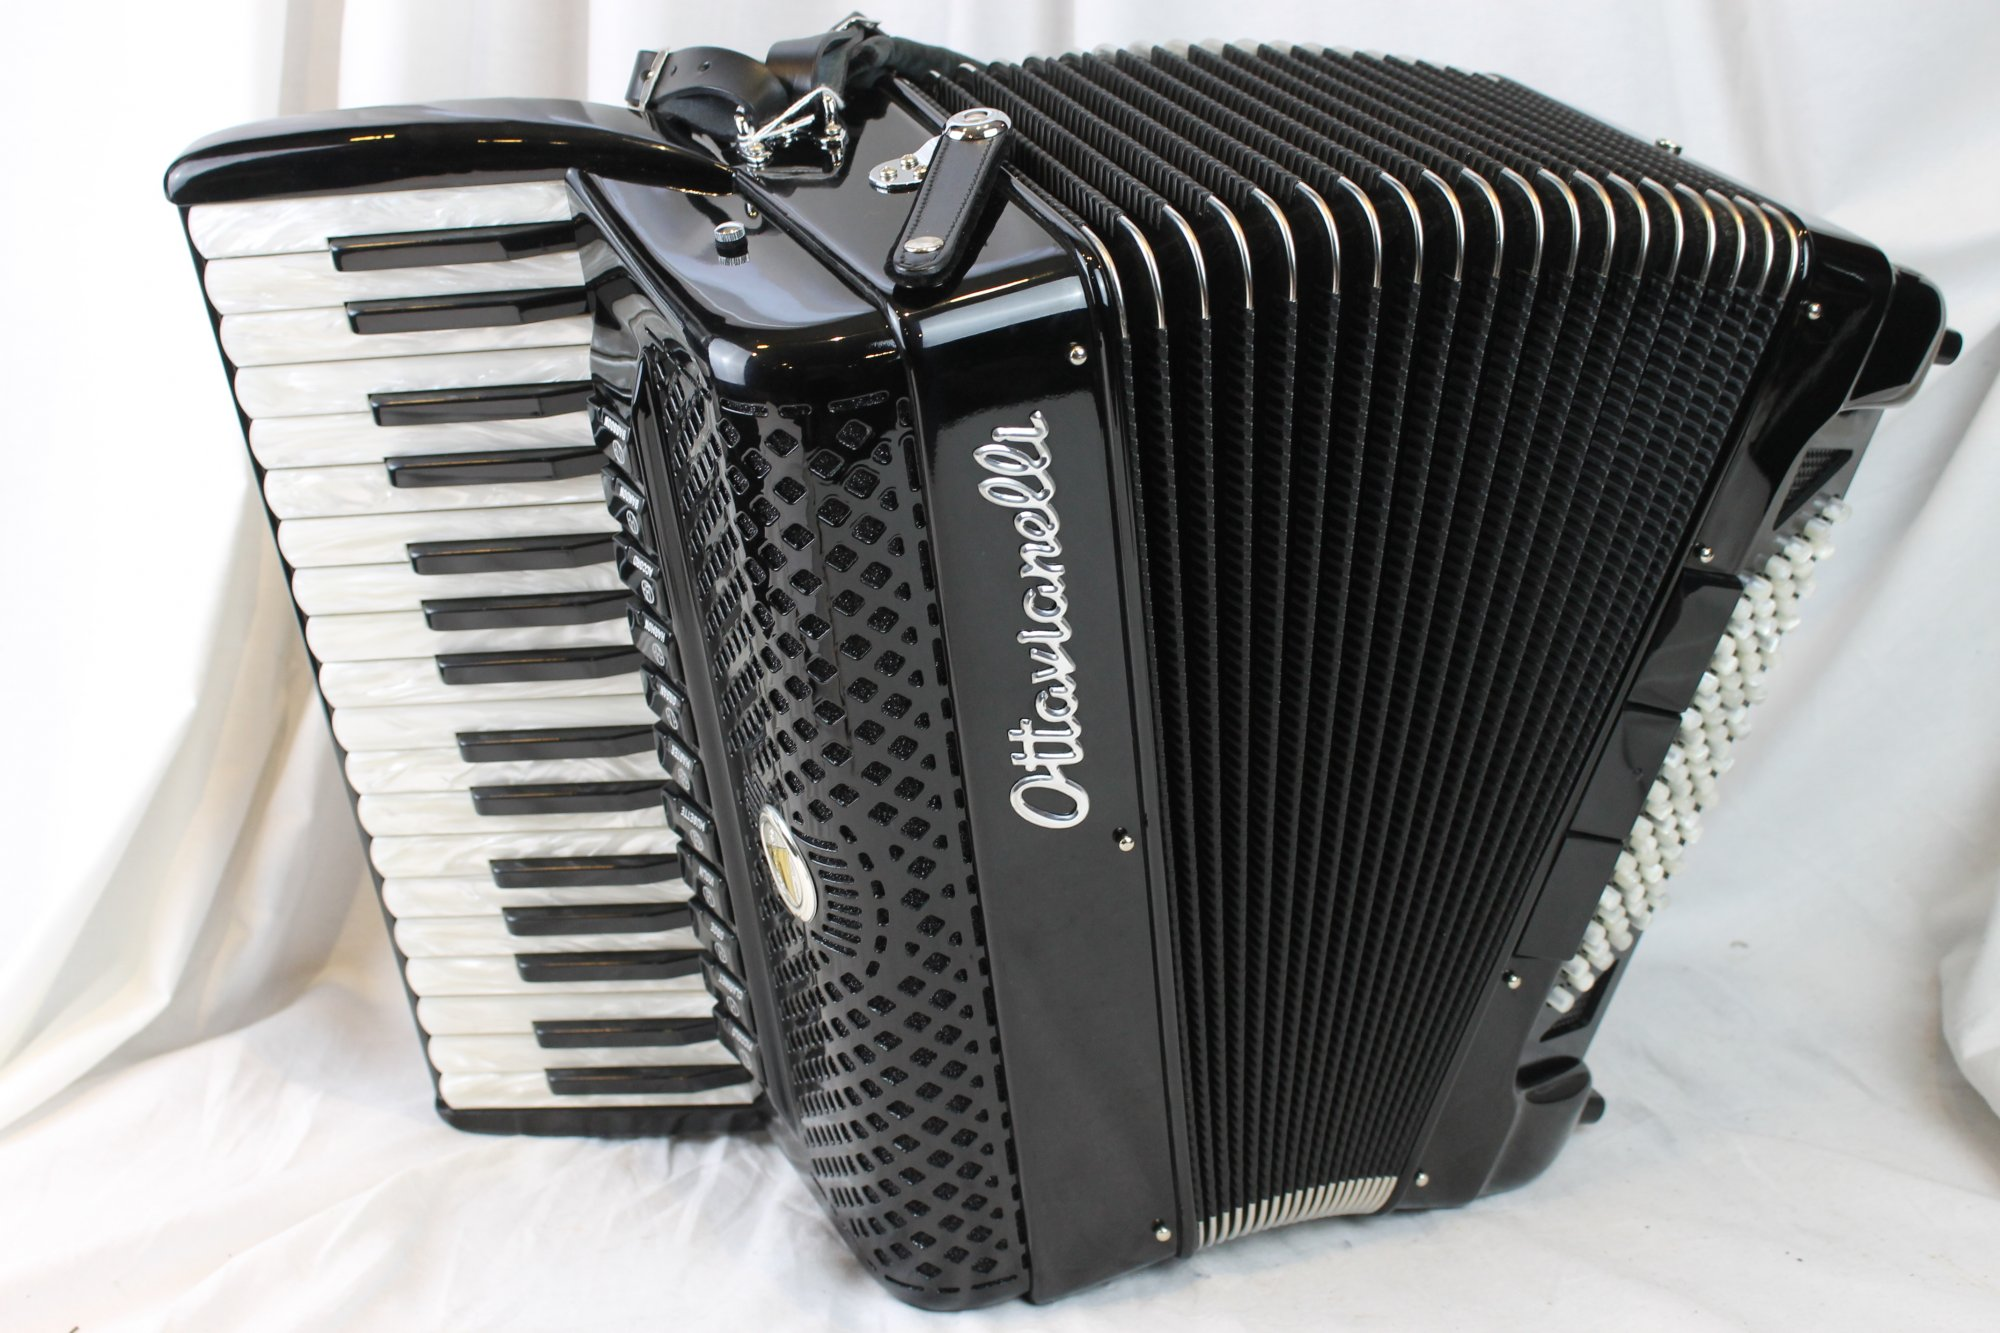 NEW Black Ottavianelli Aero II Piano Accordion LMMM 34 72